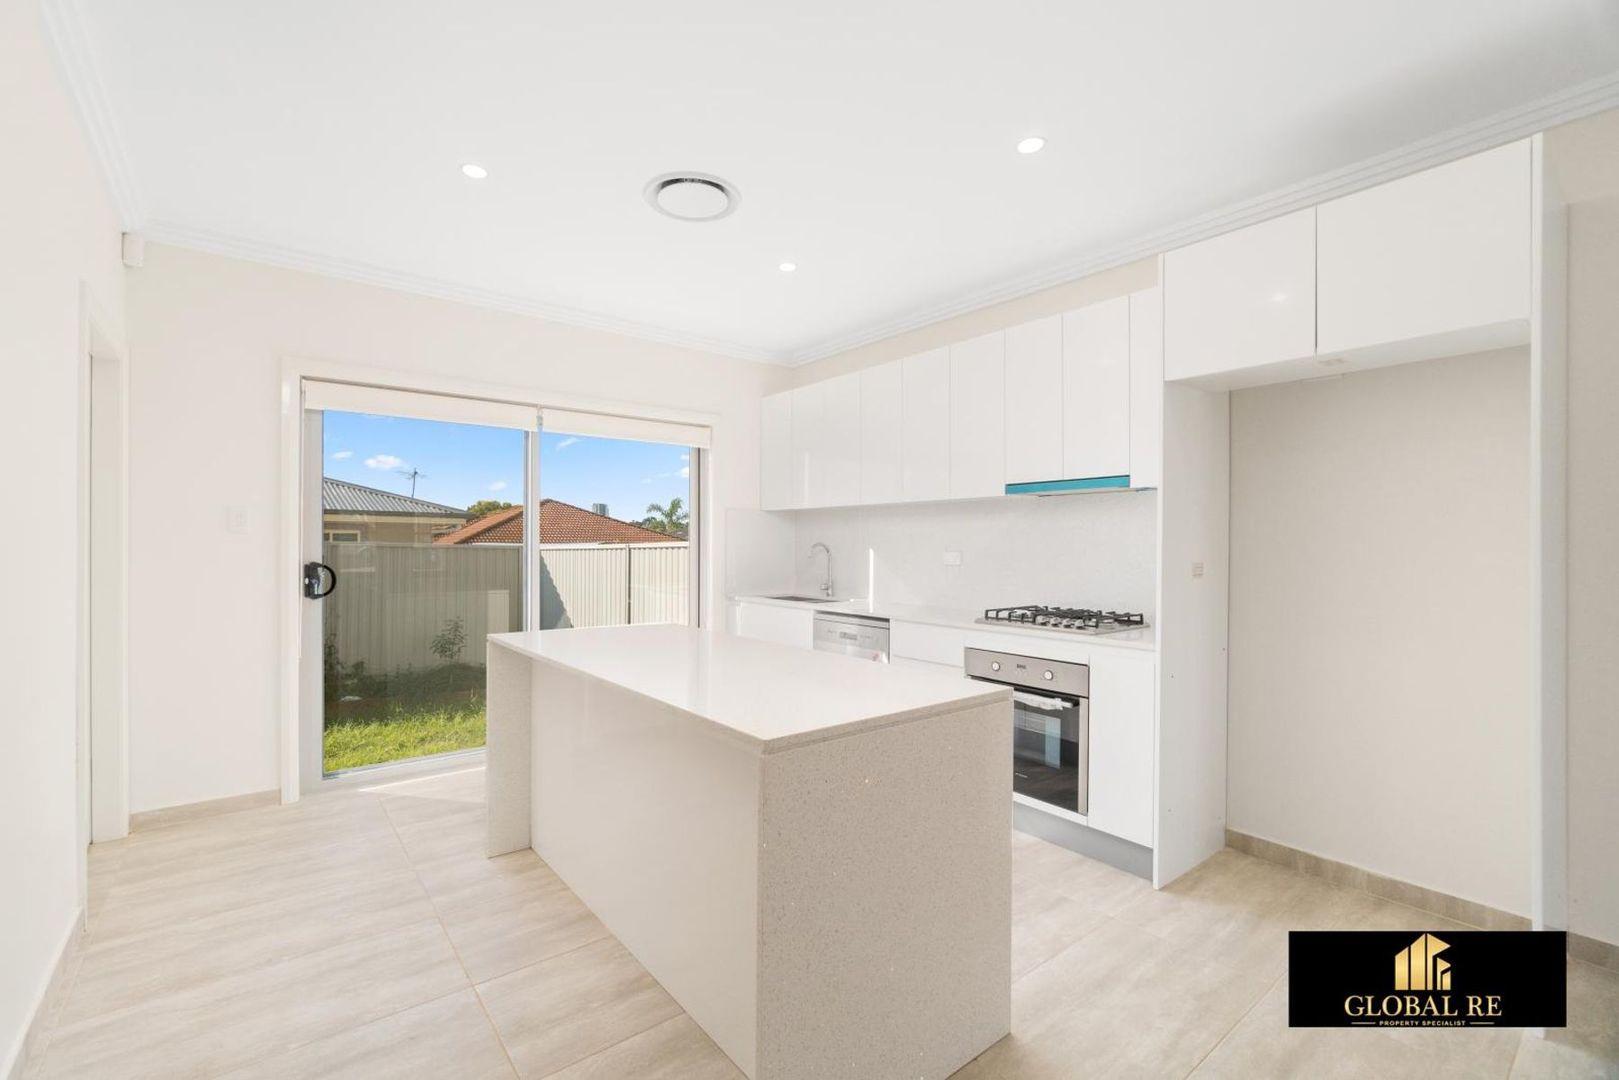 2/13-15 Gibson avenue, Casula NSW 2170, Image 1